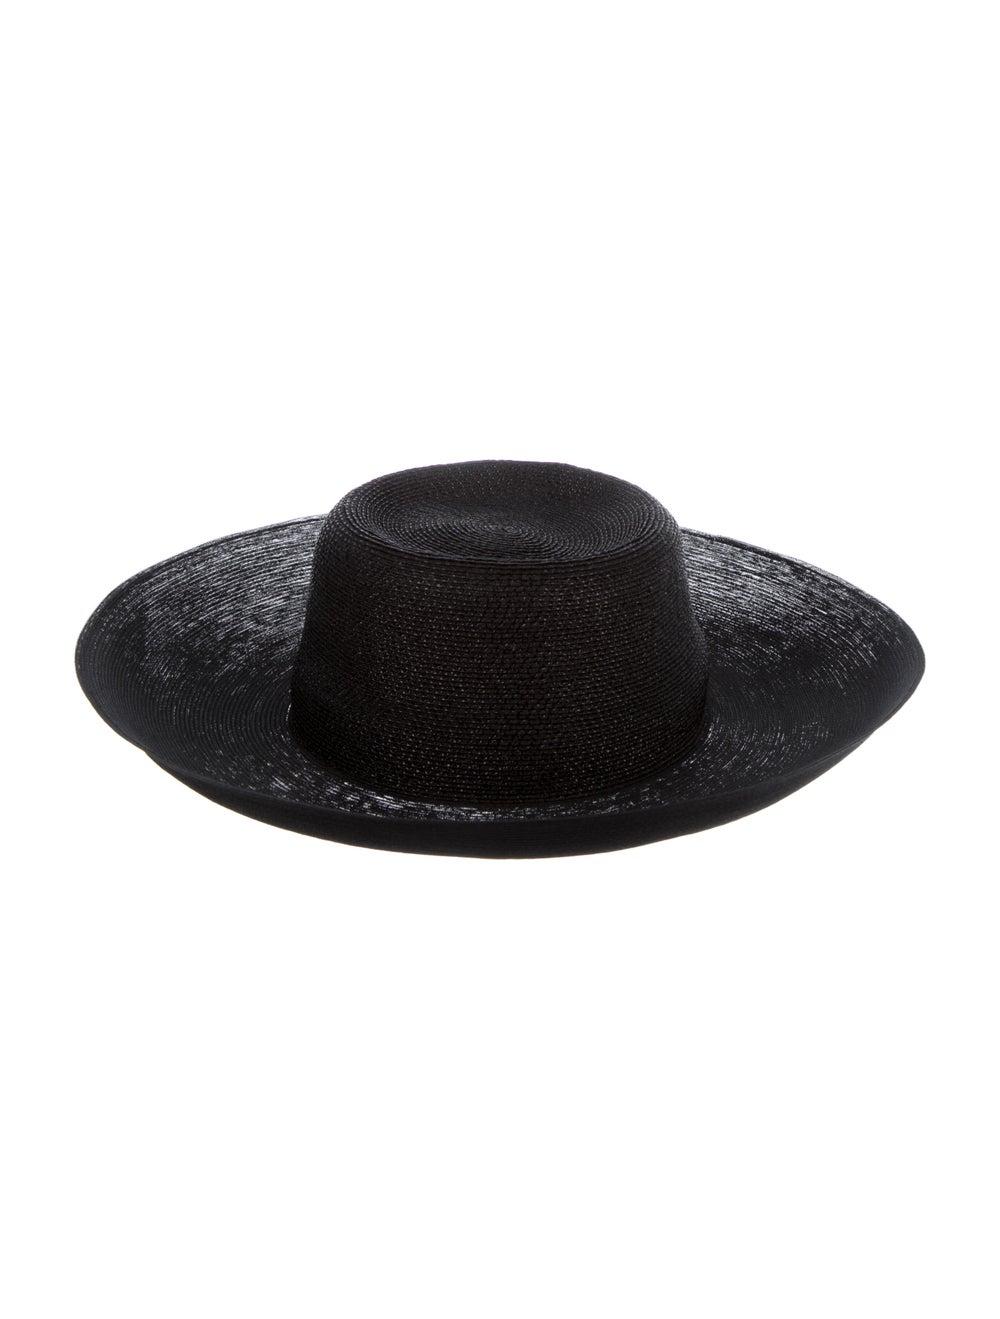 Patricia Underwood Wide-Brim Straw Hat Black - image 1